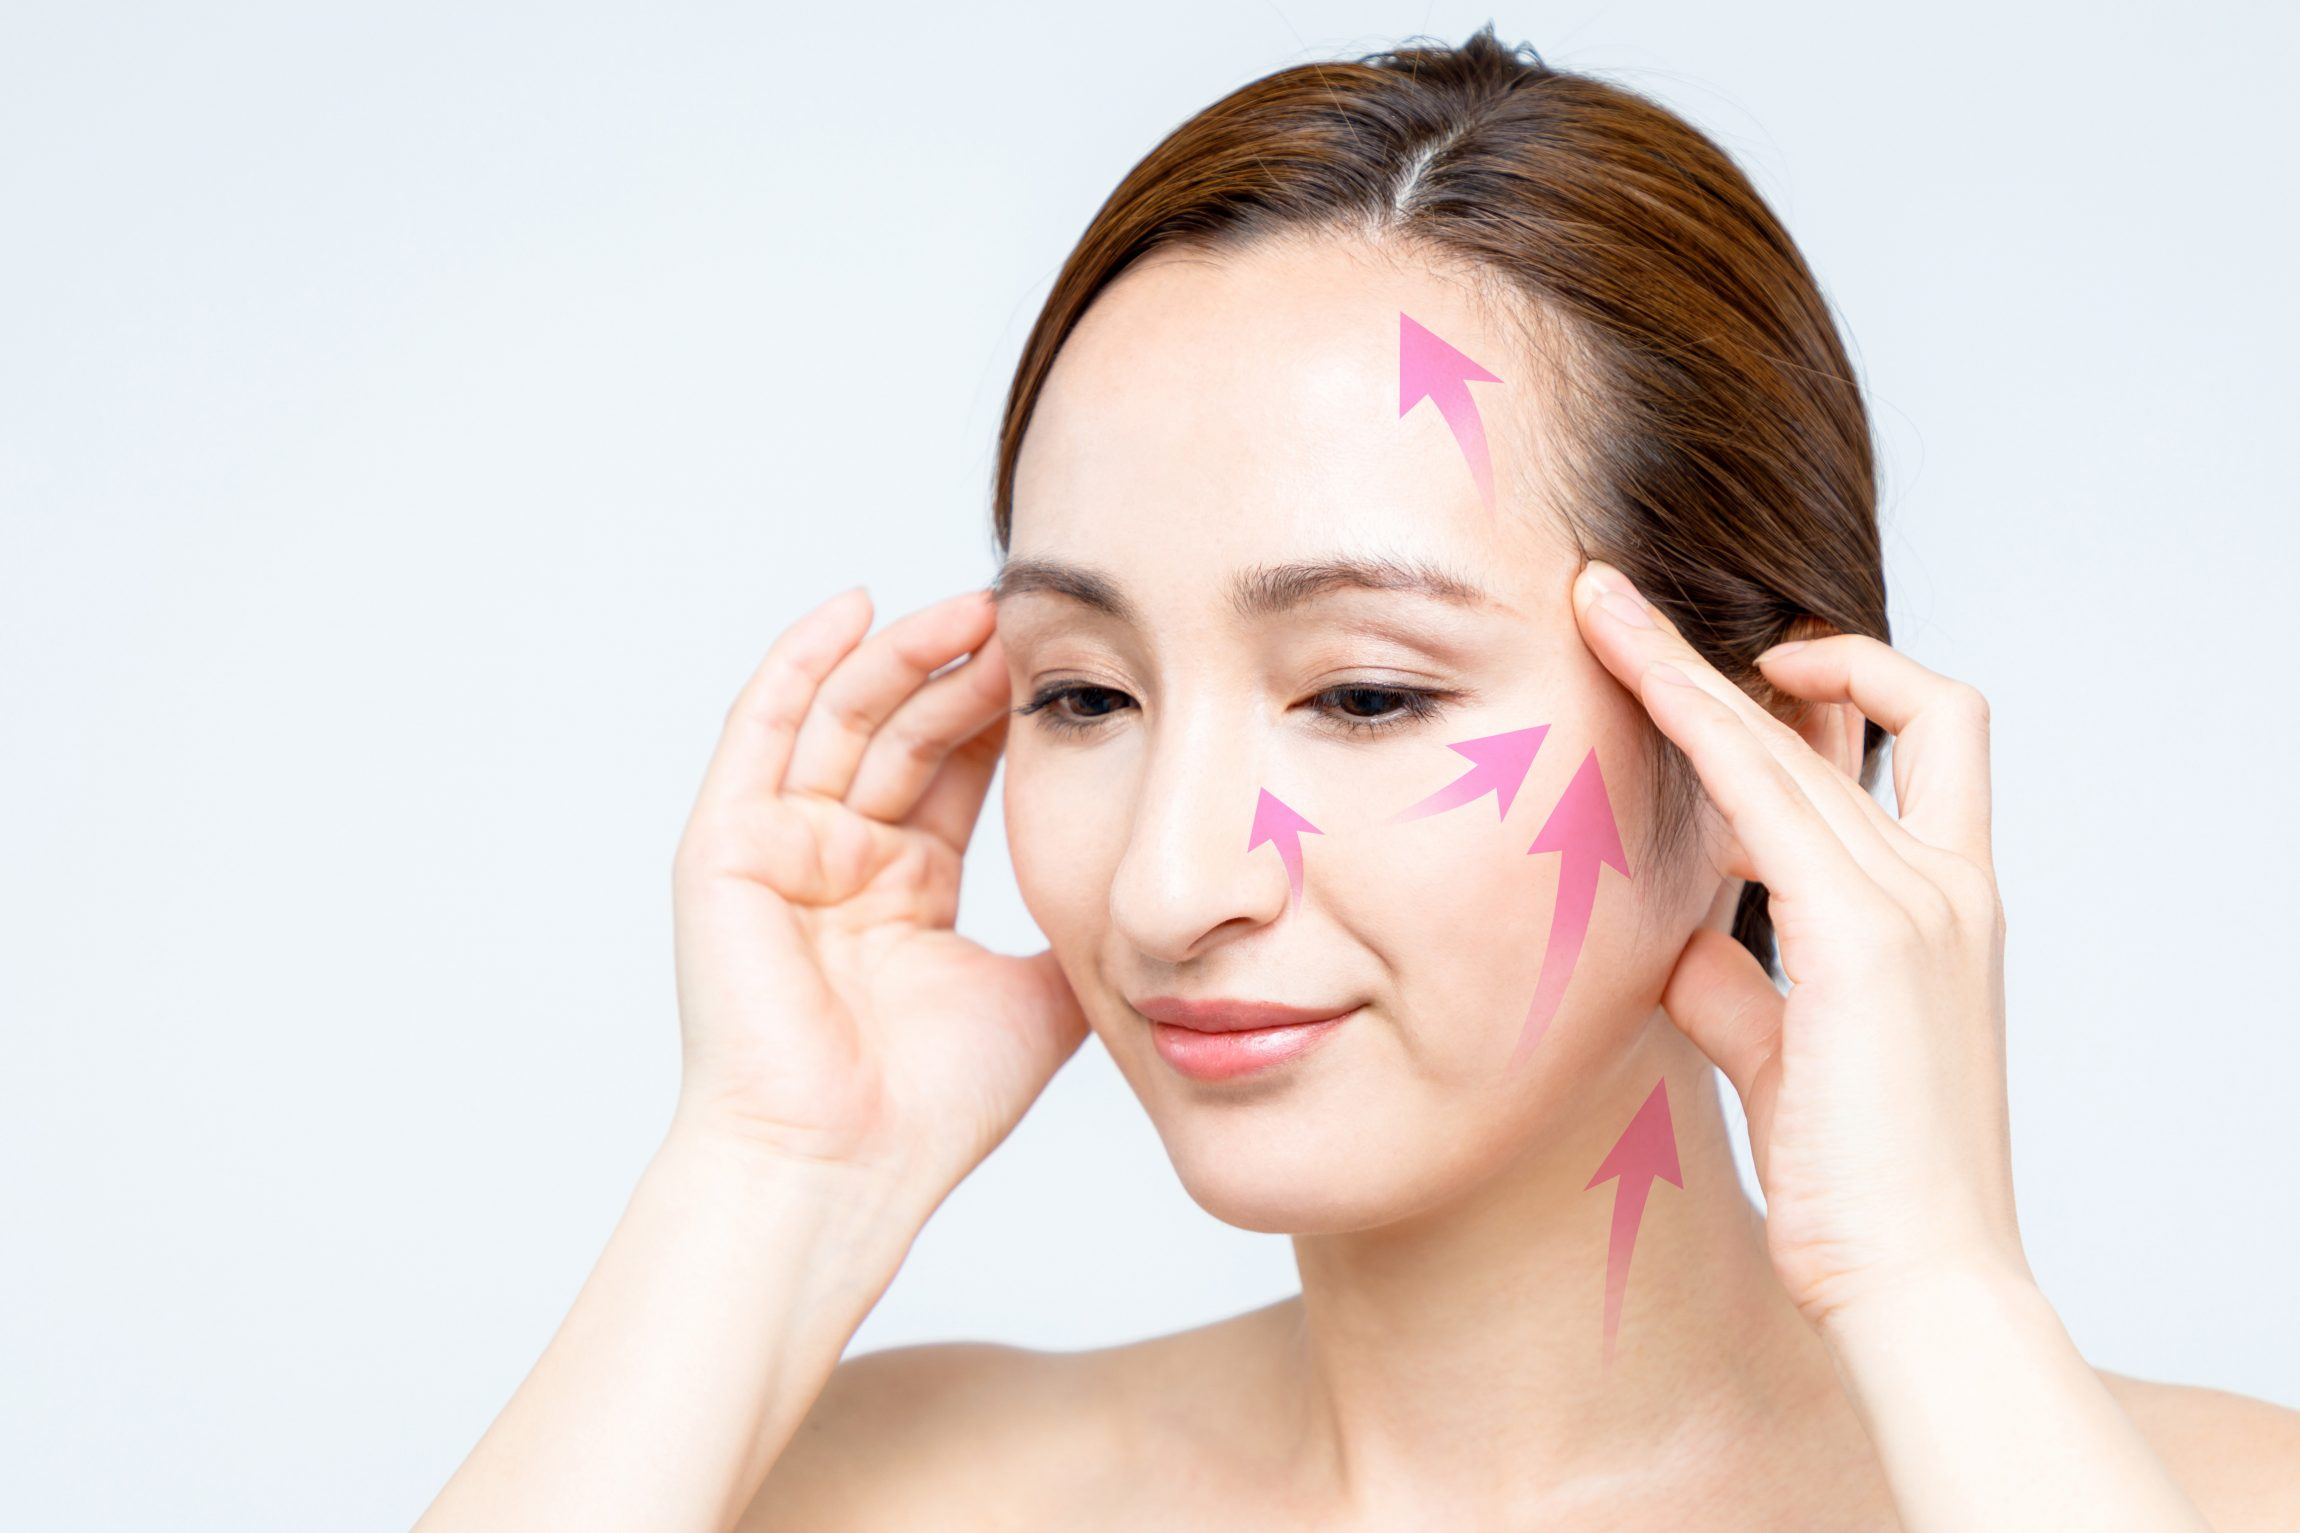 face lift up massage. women's beauty concept.